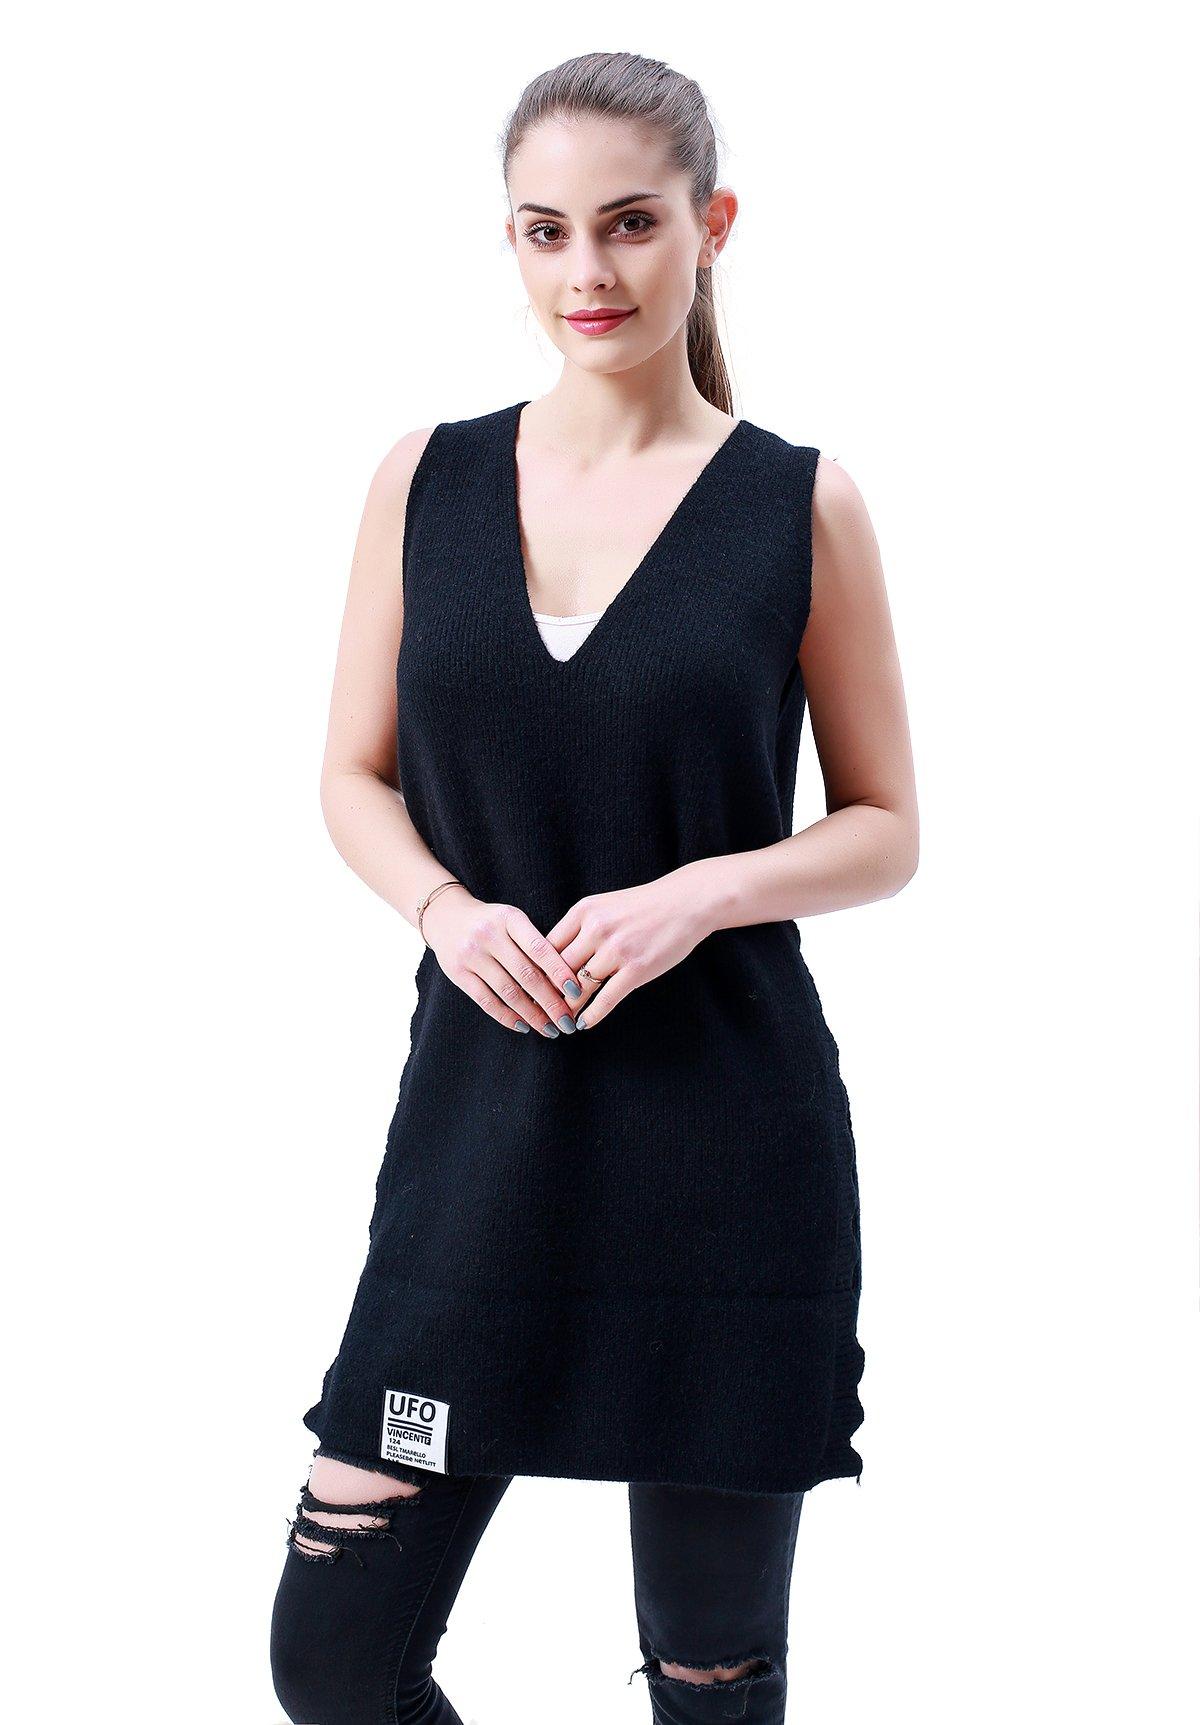 MEEFUR Women's Autumn Stylish Sleeveless Knitwear Cotton Long Pullover Deep V-Neck Hole Design Sexy Sweater Vest Black